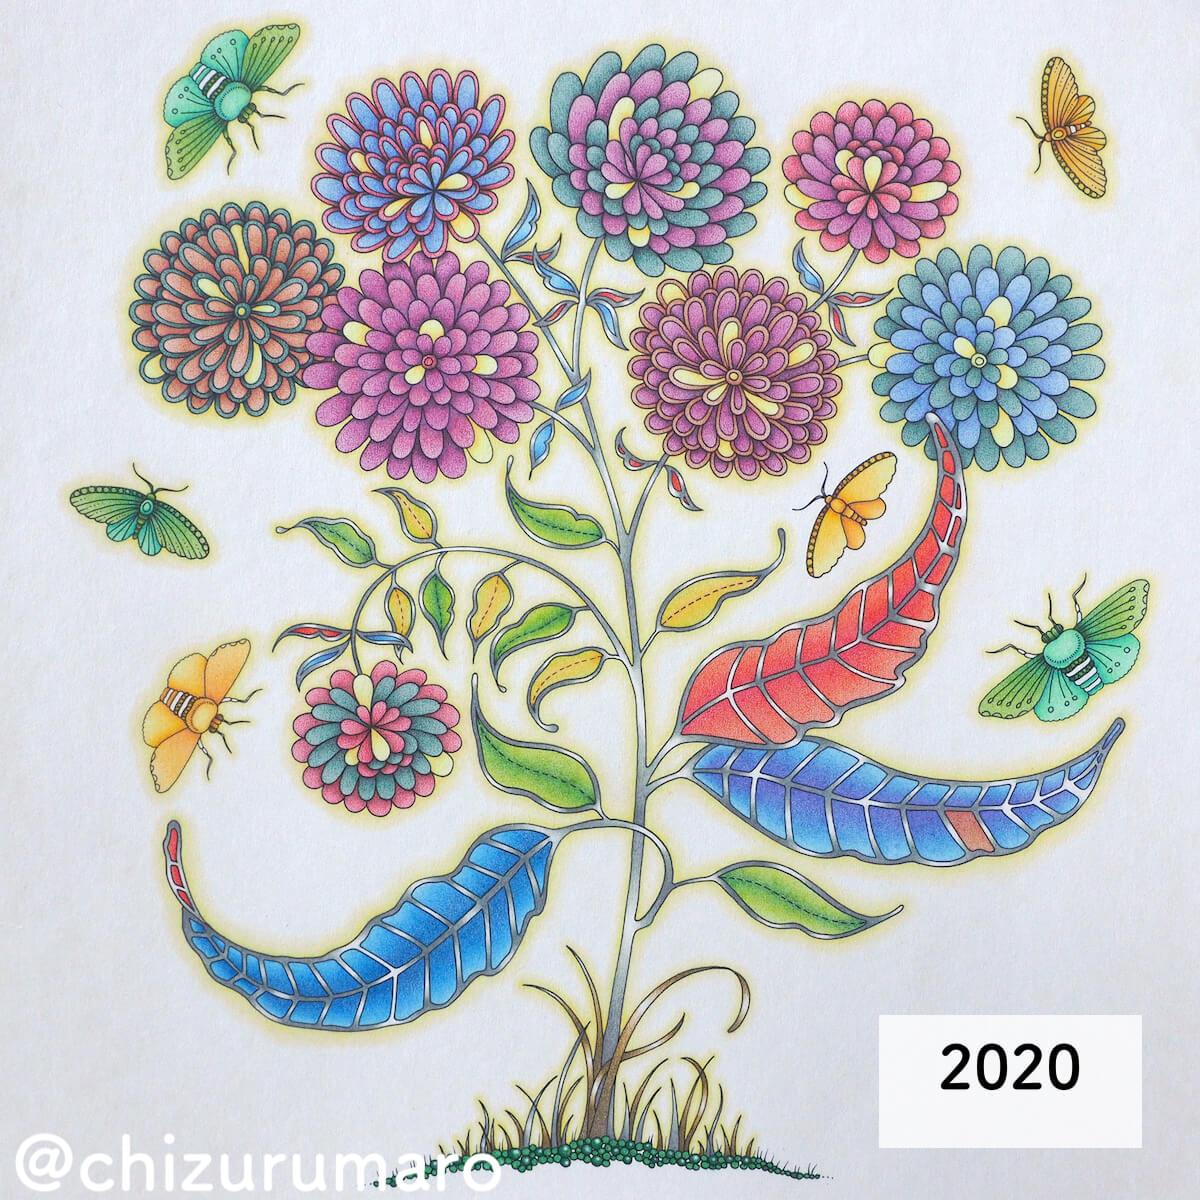 f:id:chizurumaro:20200718111820j:plain